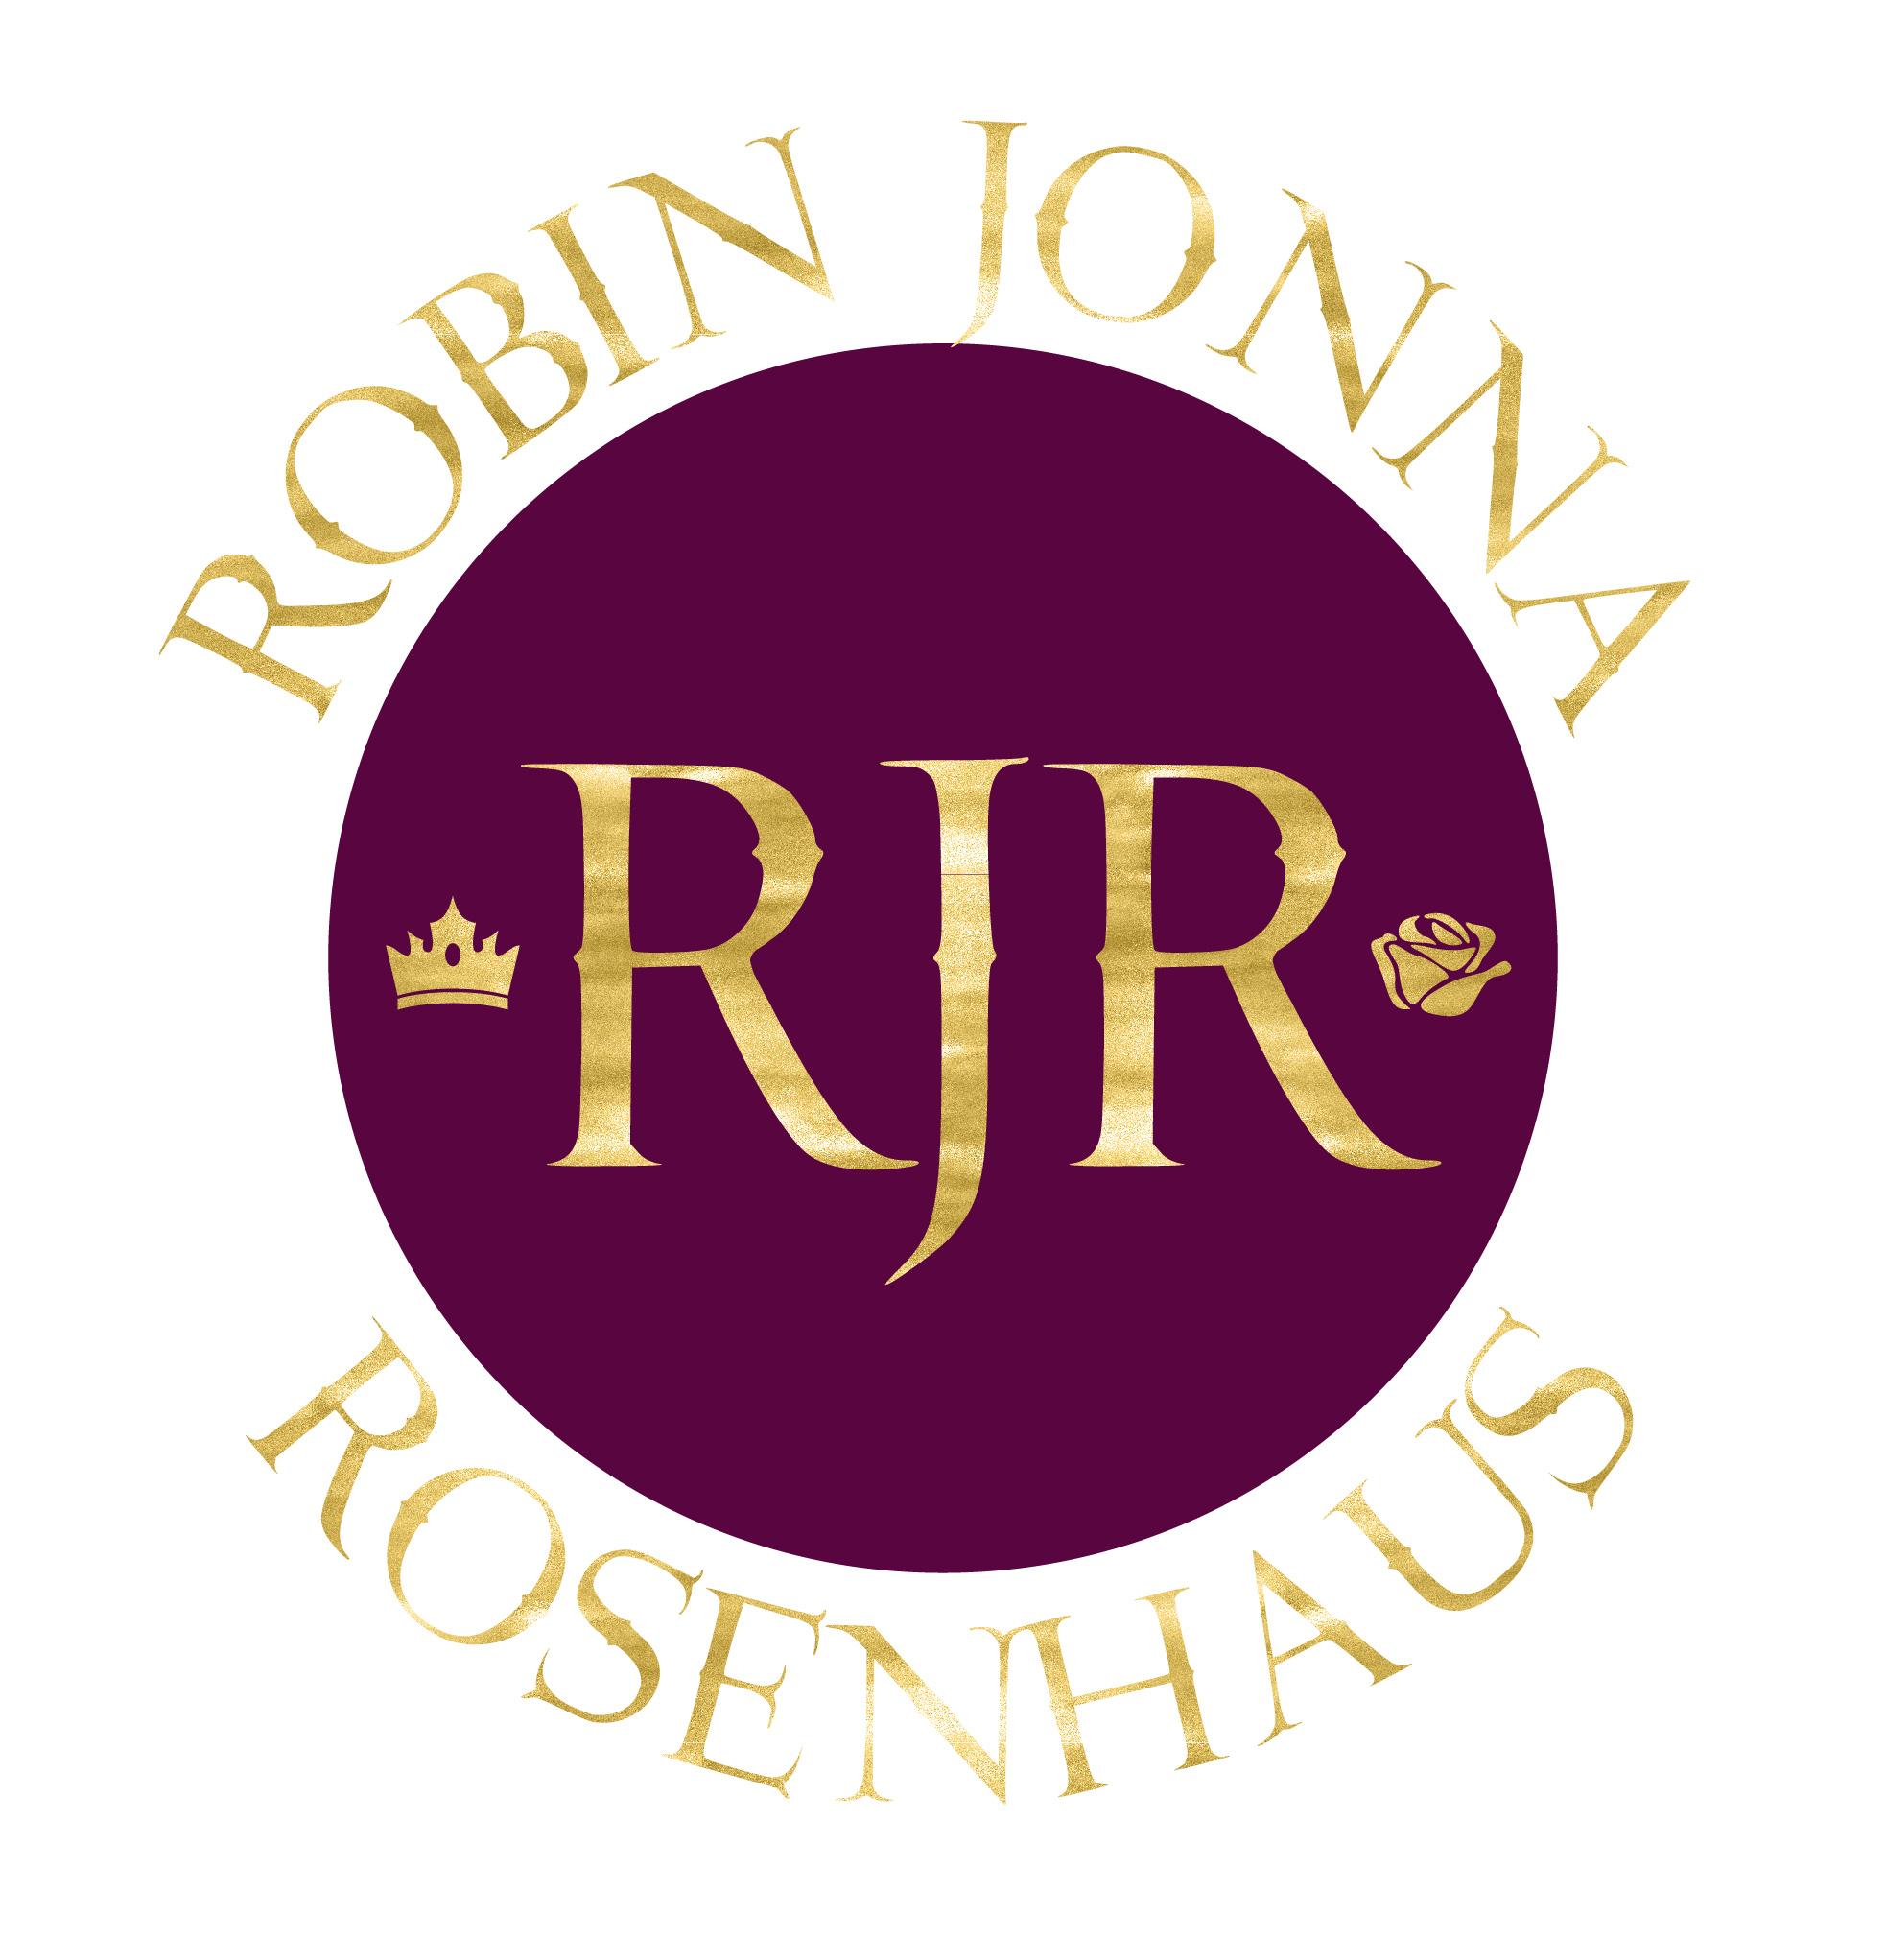 Robin Jonna Rosenhaus logo-09.jpg